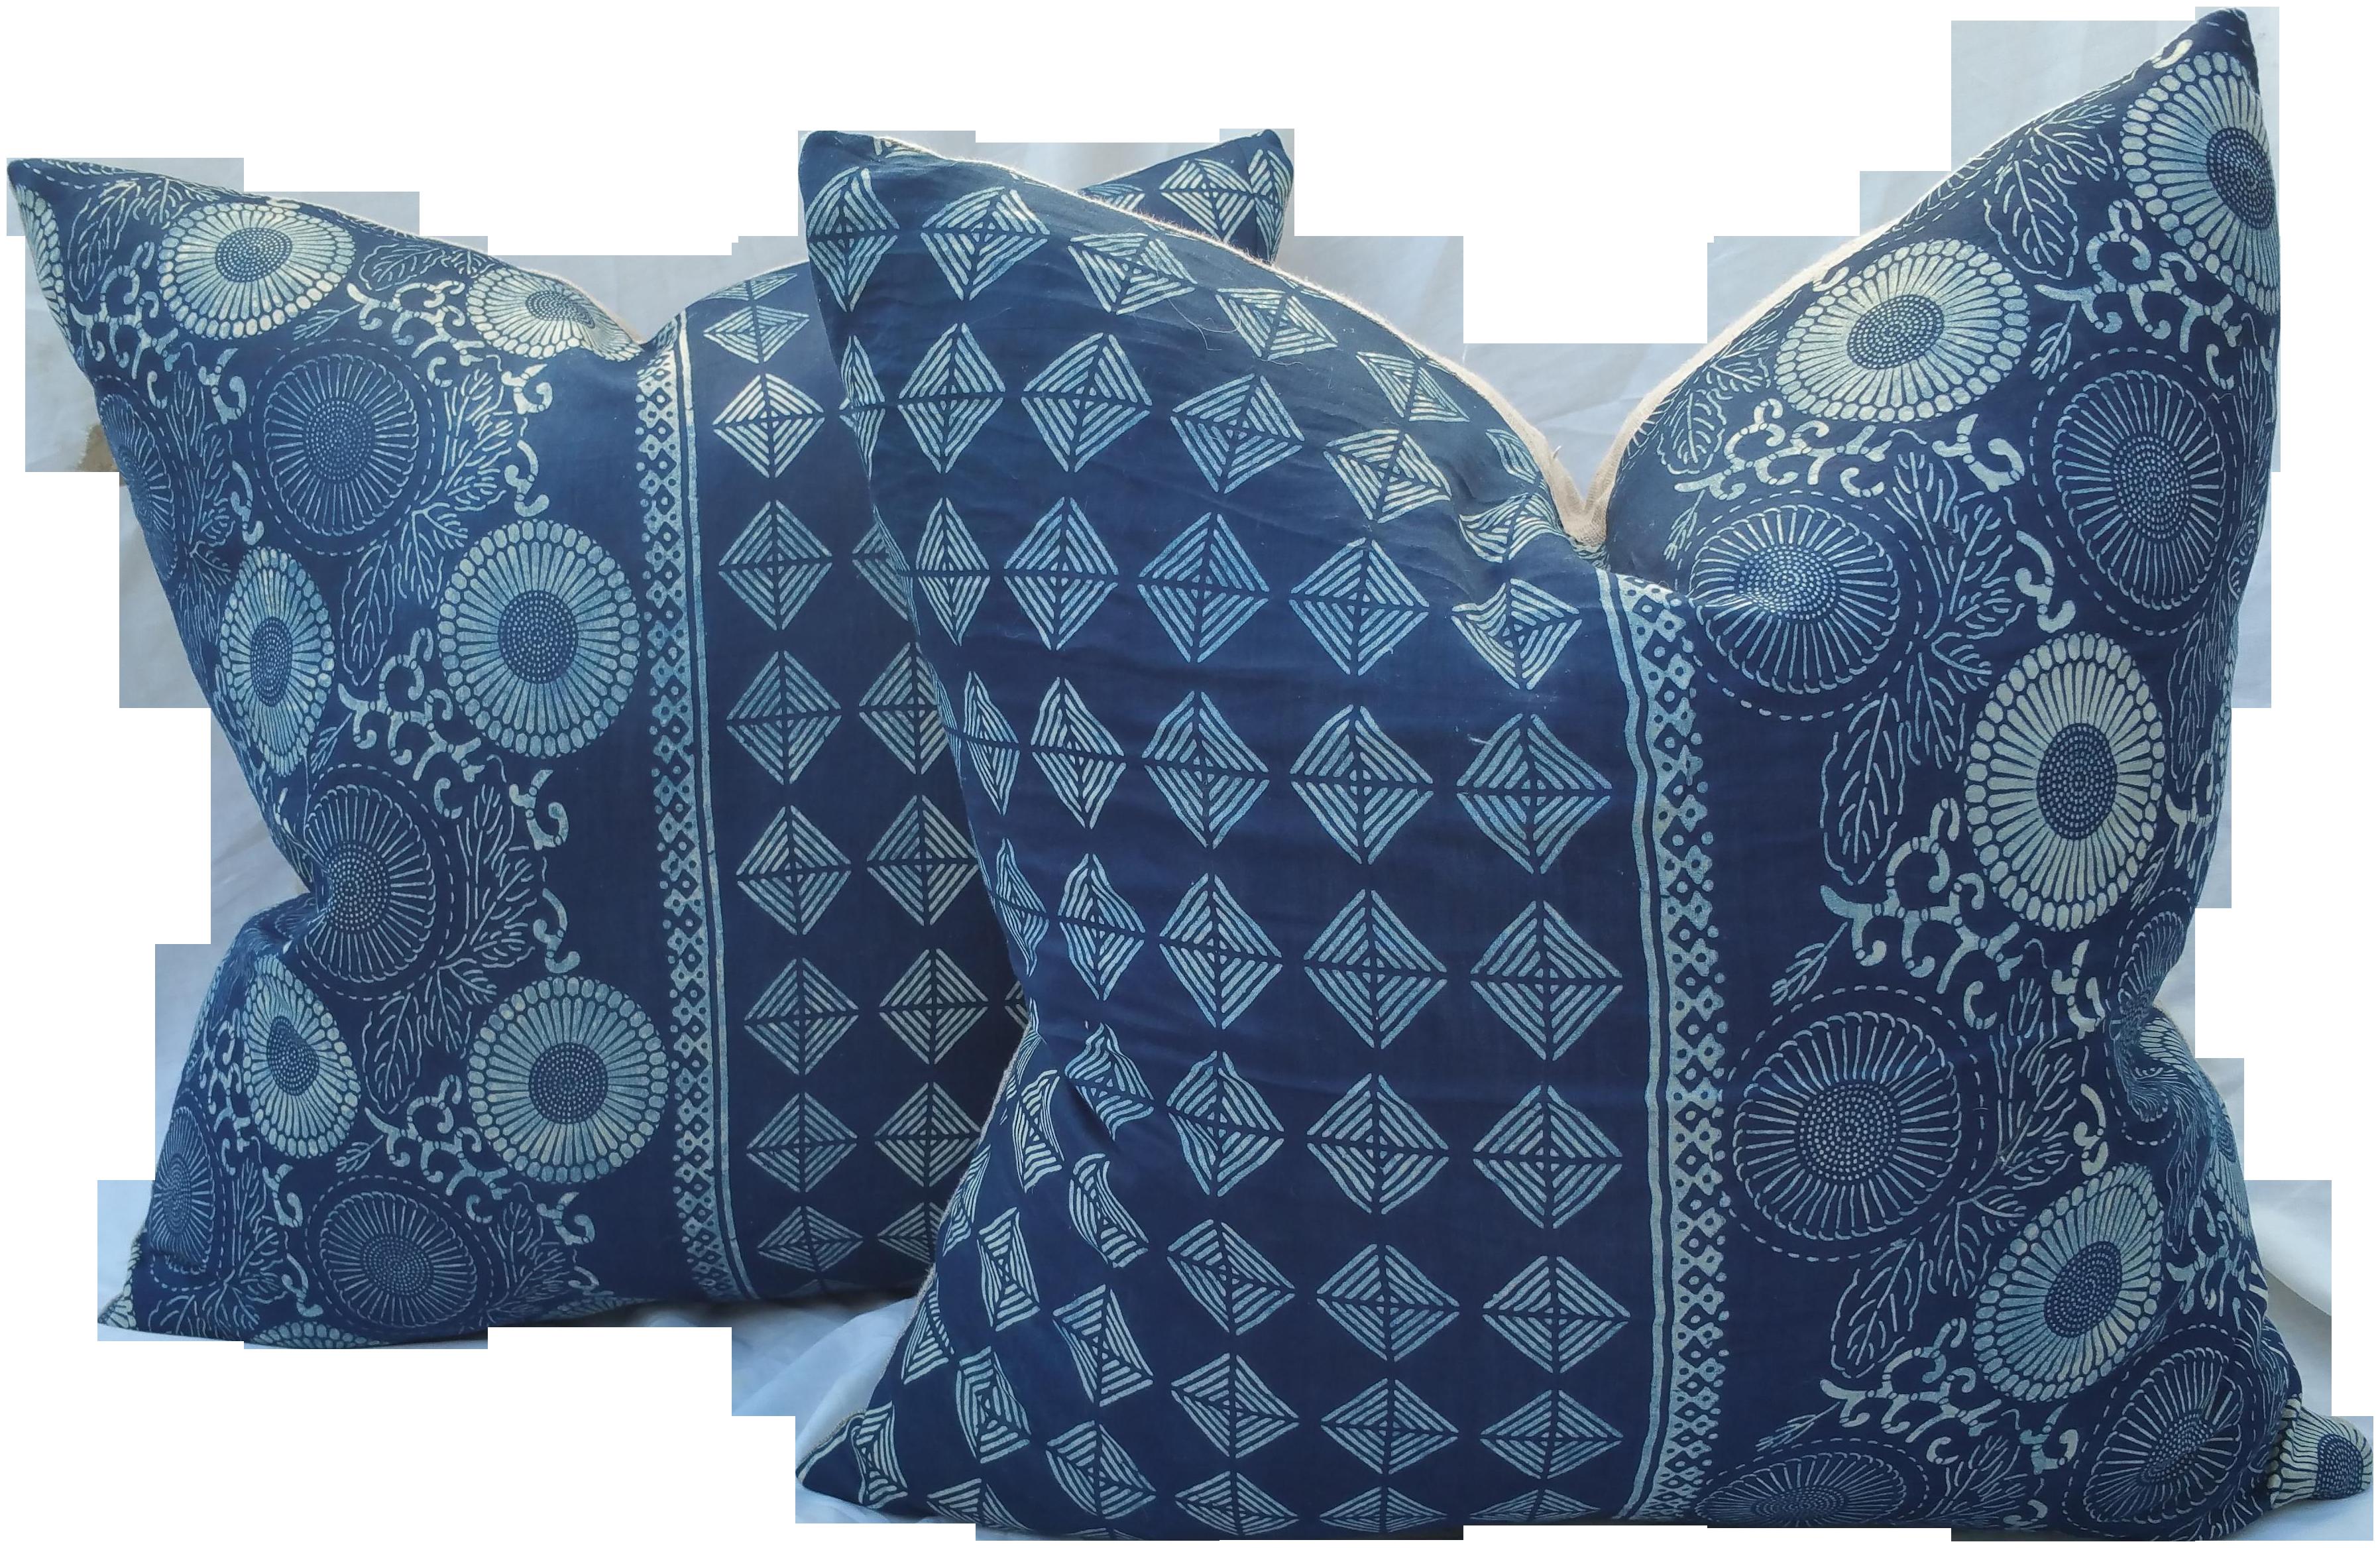 Well-liked Japanese Vintage Silk Batik Indigo Pillows | Chairish PD61